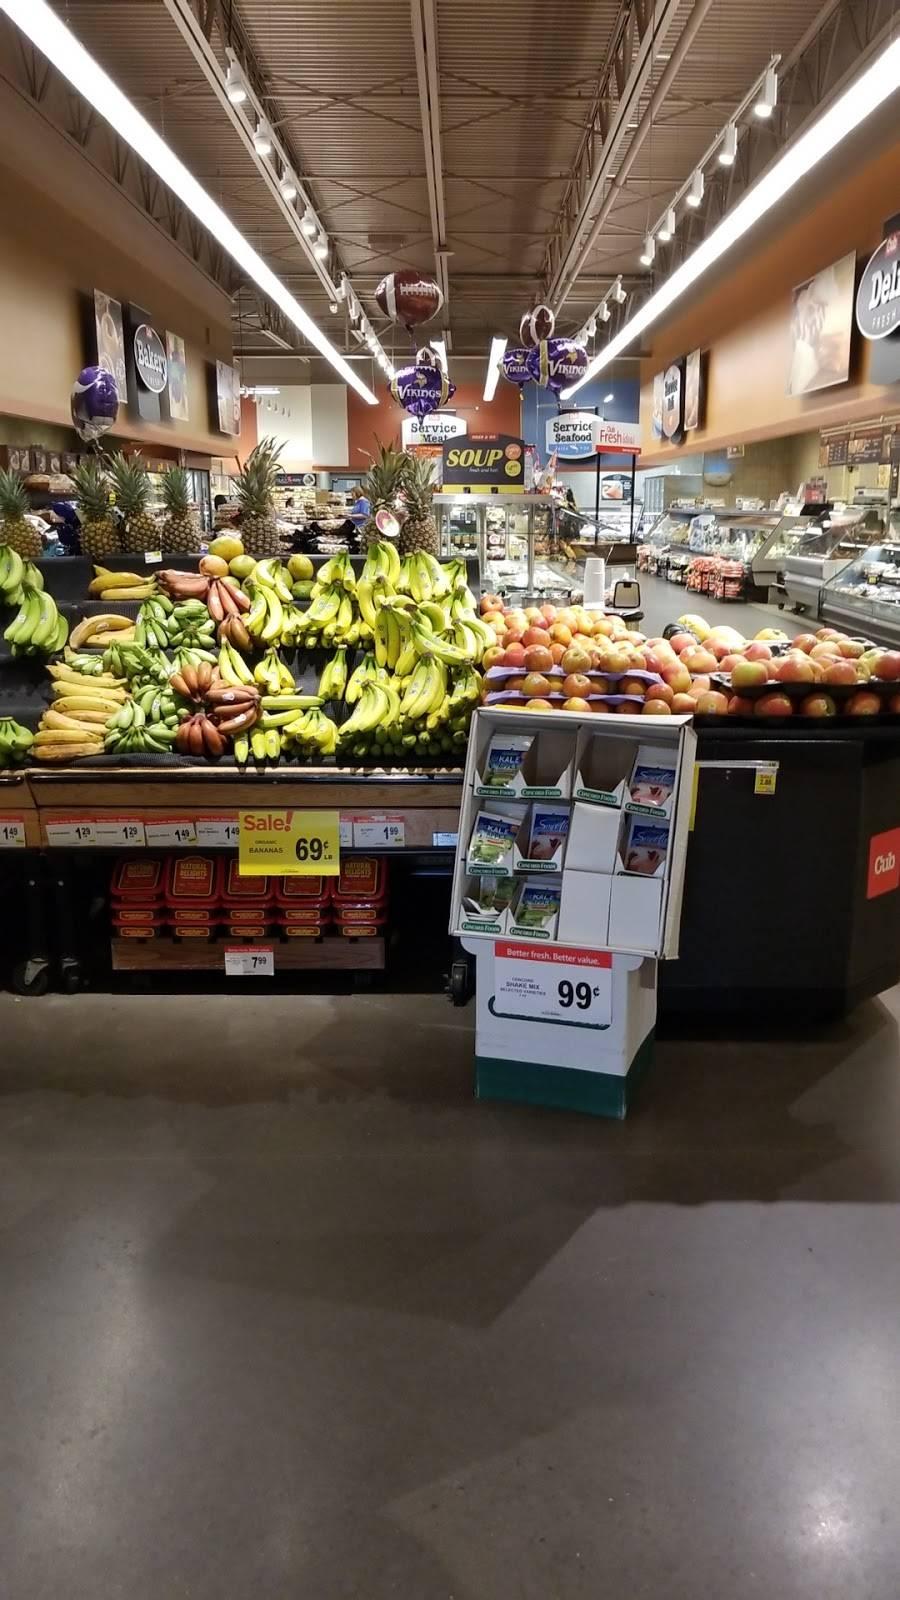 Cub Foods - pharmacy  | Photo 7 of 10 | Address: 1201 Larpenteur Ave W, Roseville, MN 55113, USA | Phone: (651) 488-1825